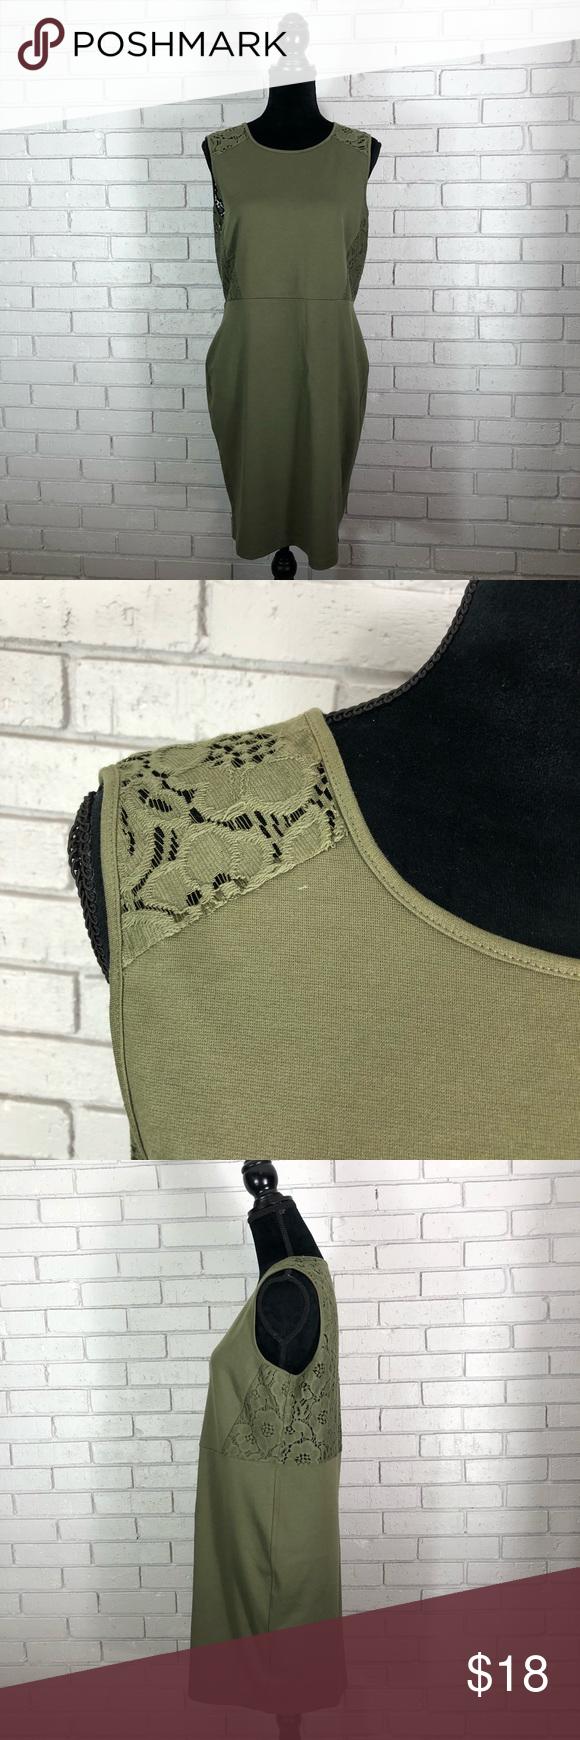 H&m green lace dress  HuM Womenus Olive Green Dress  Pinterest